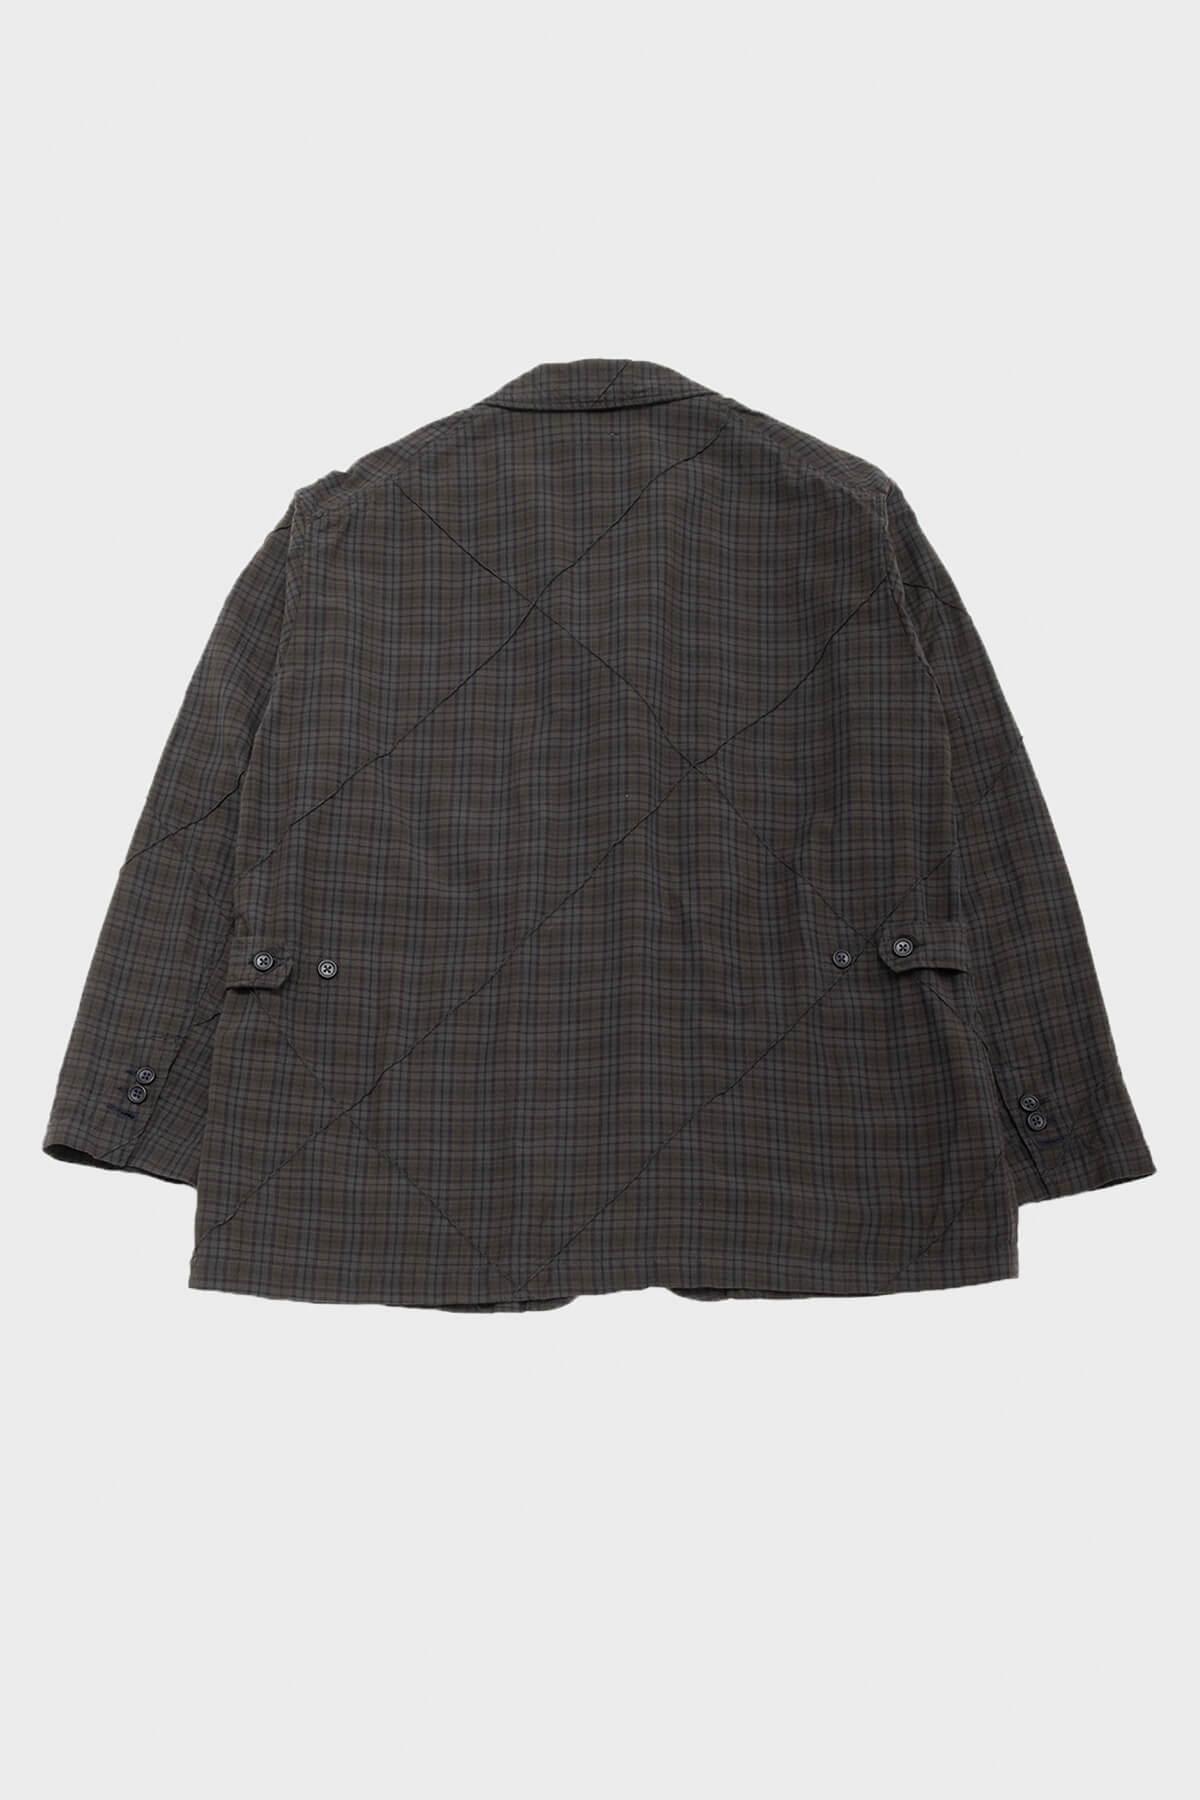 engineered garments loiter jacket